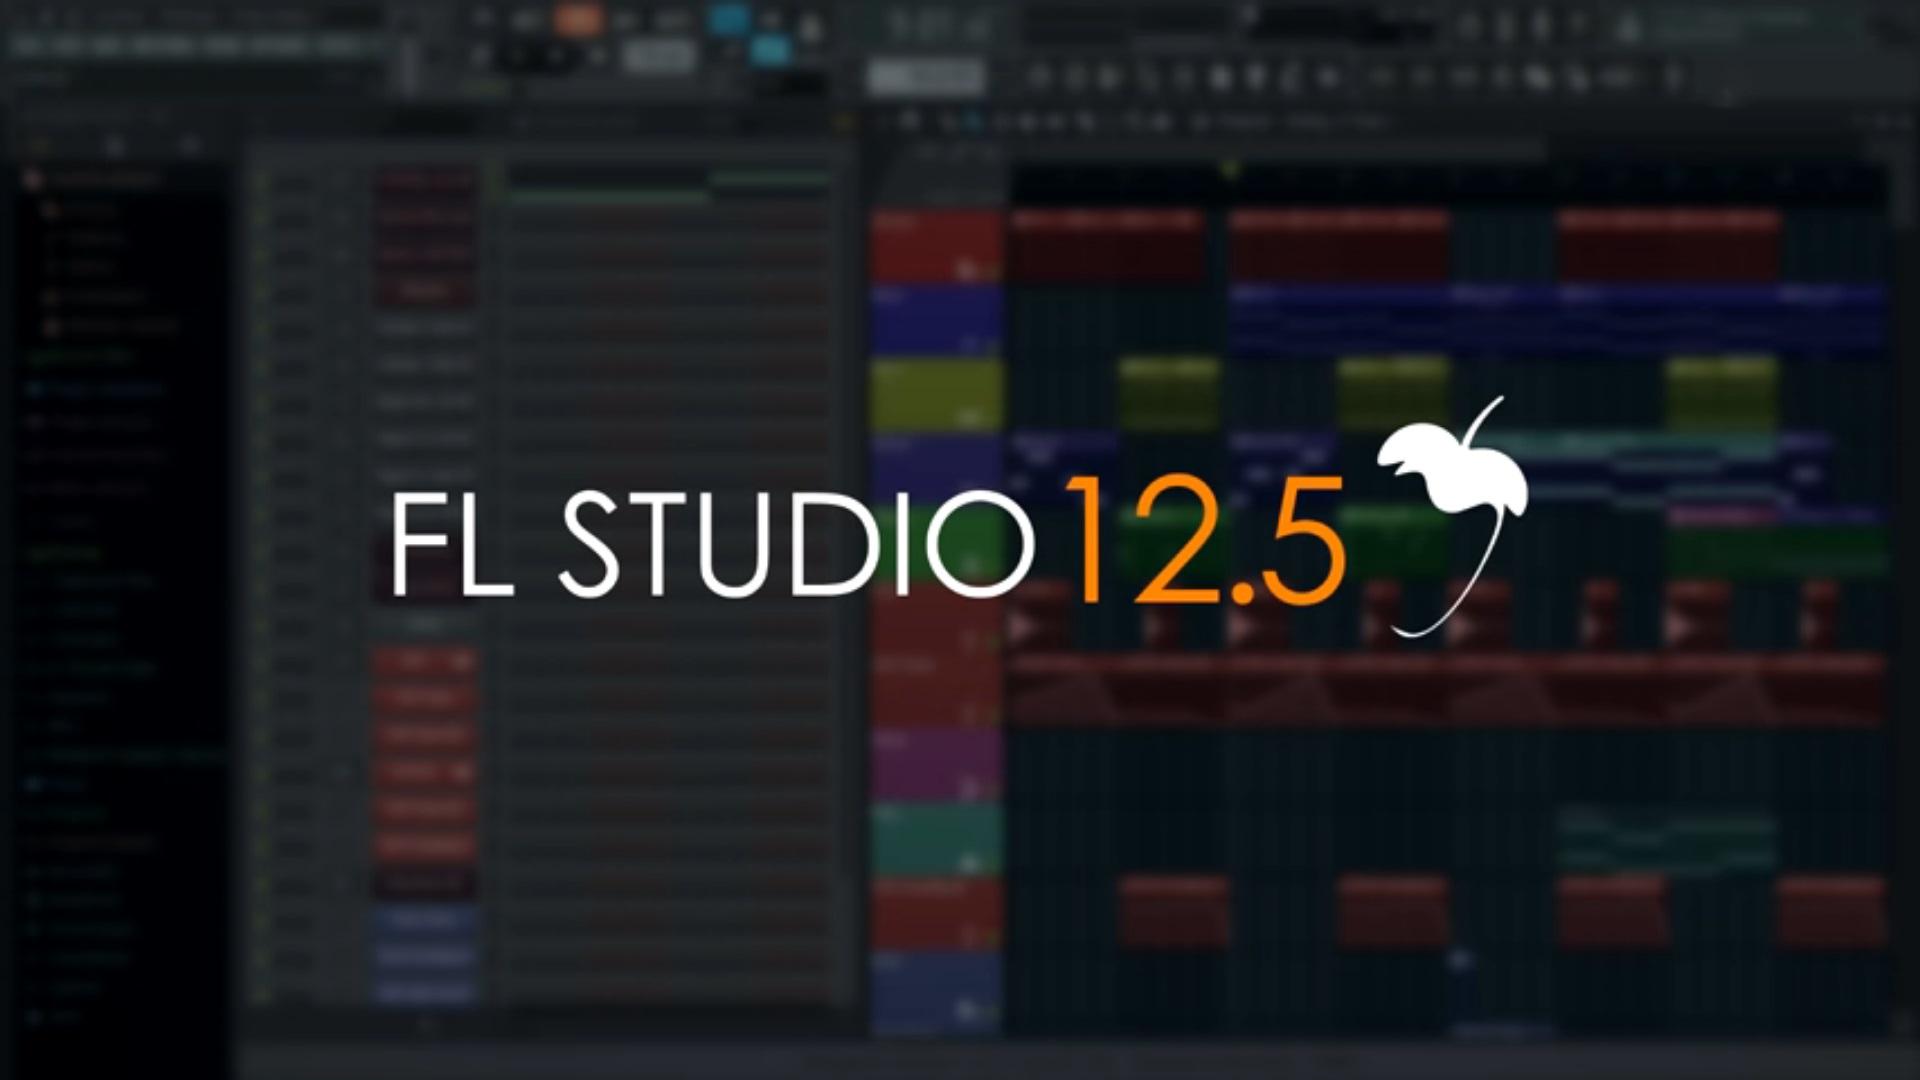 Fl Studio 12.5 Download